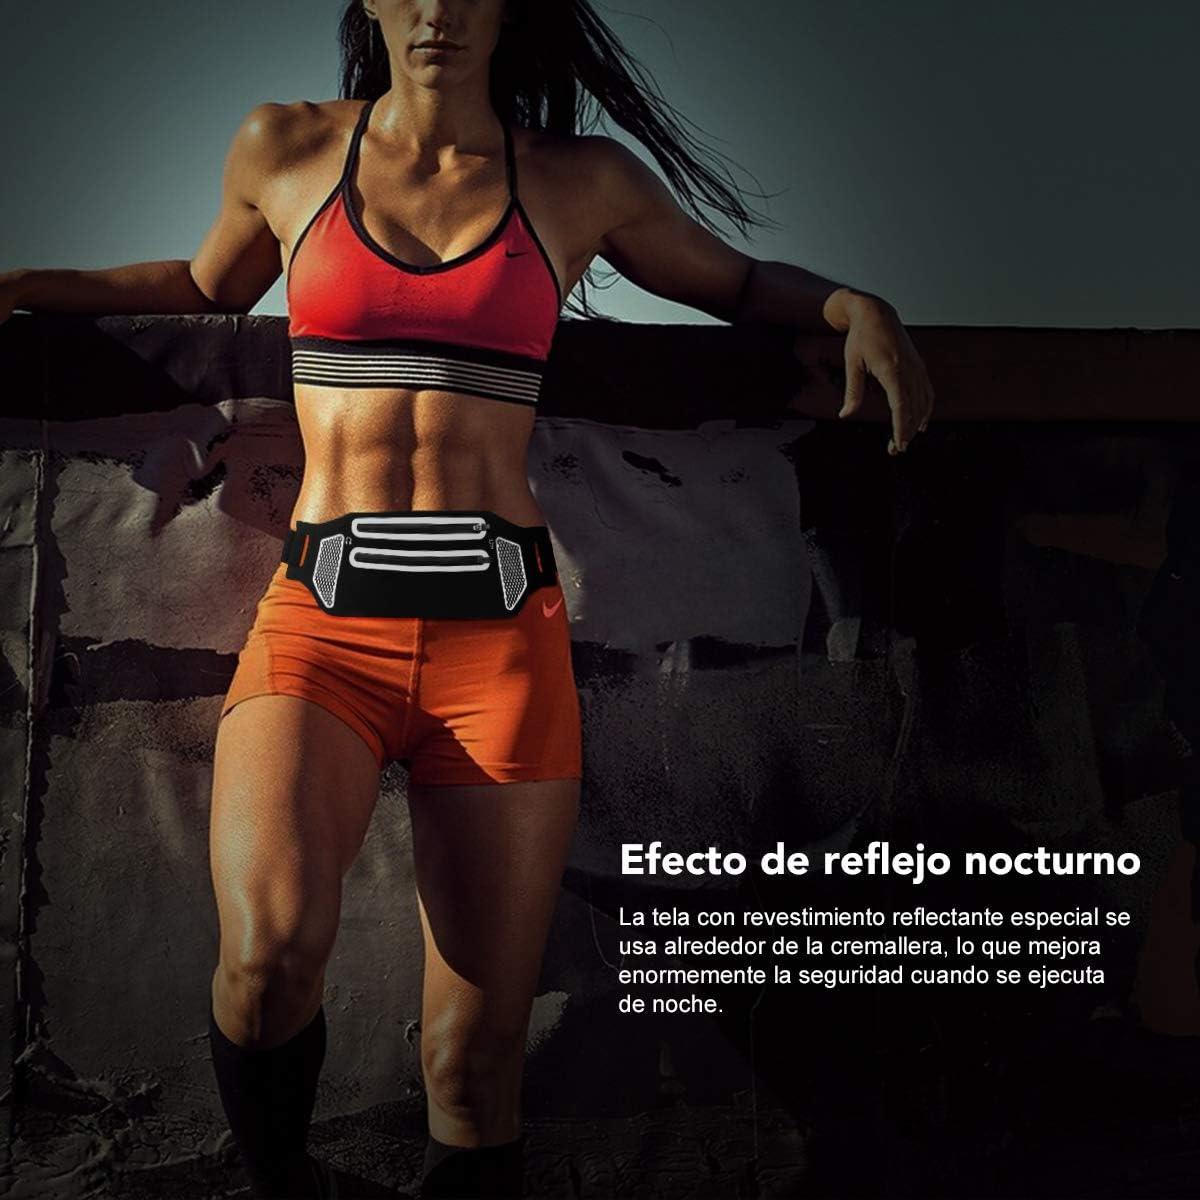 Ri/ñonera Running Mujer Hombre Impermeable con Bandas Reflectantes VILIMO Ri/ñonera Deportiva